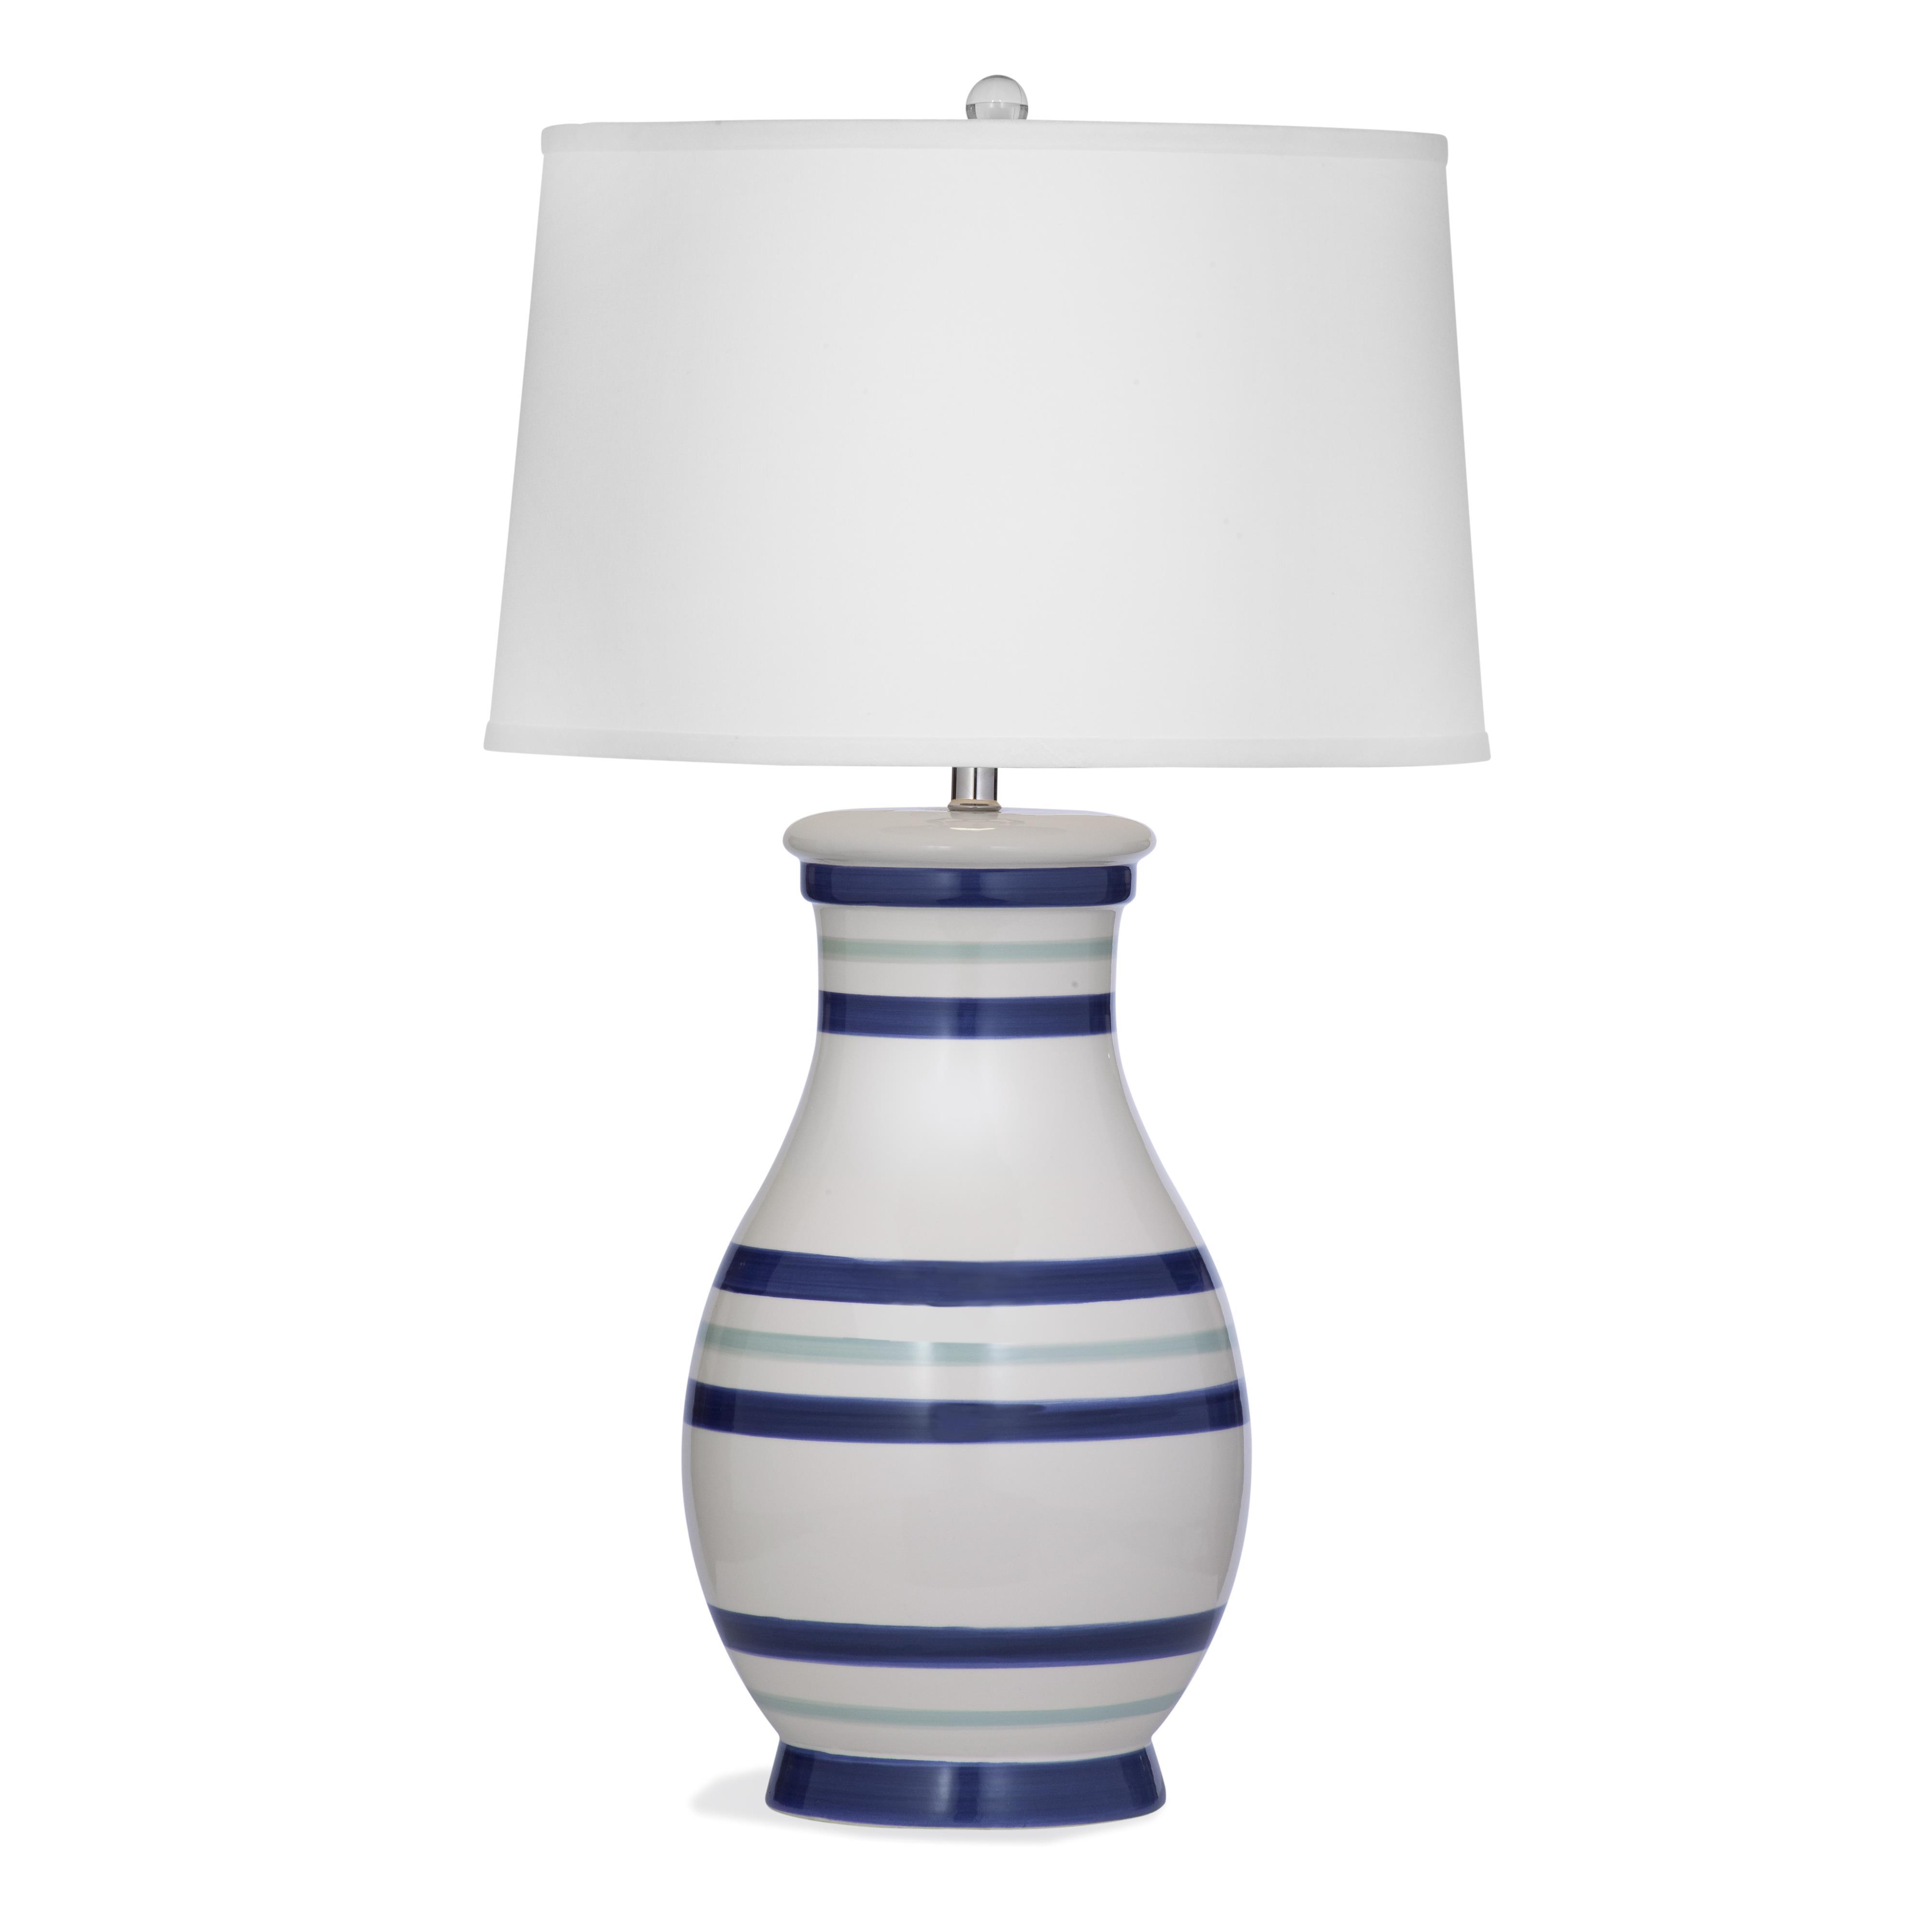 Siesta Table Lamp